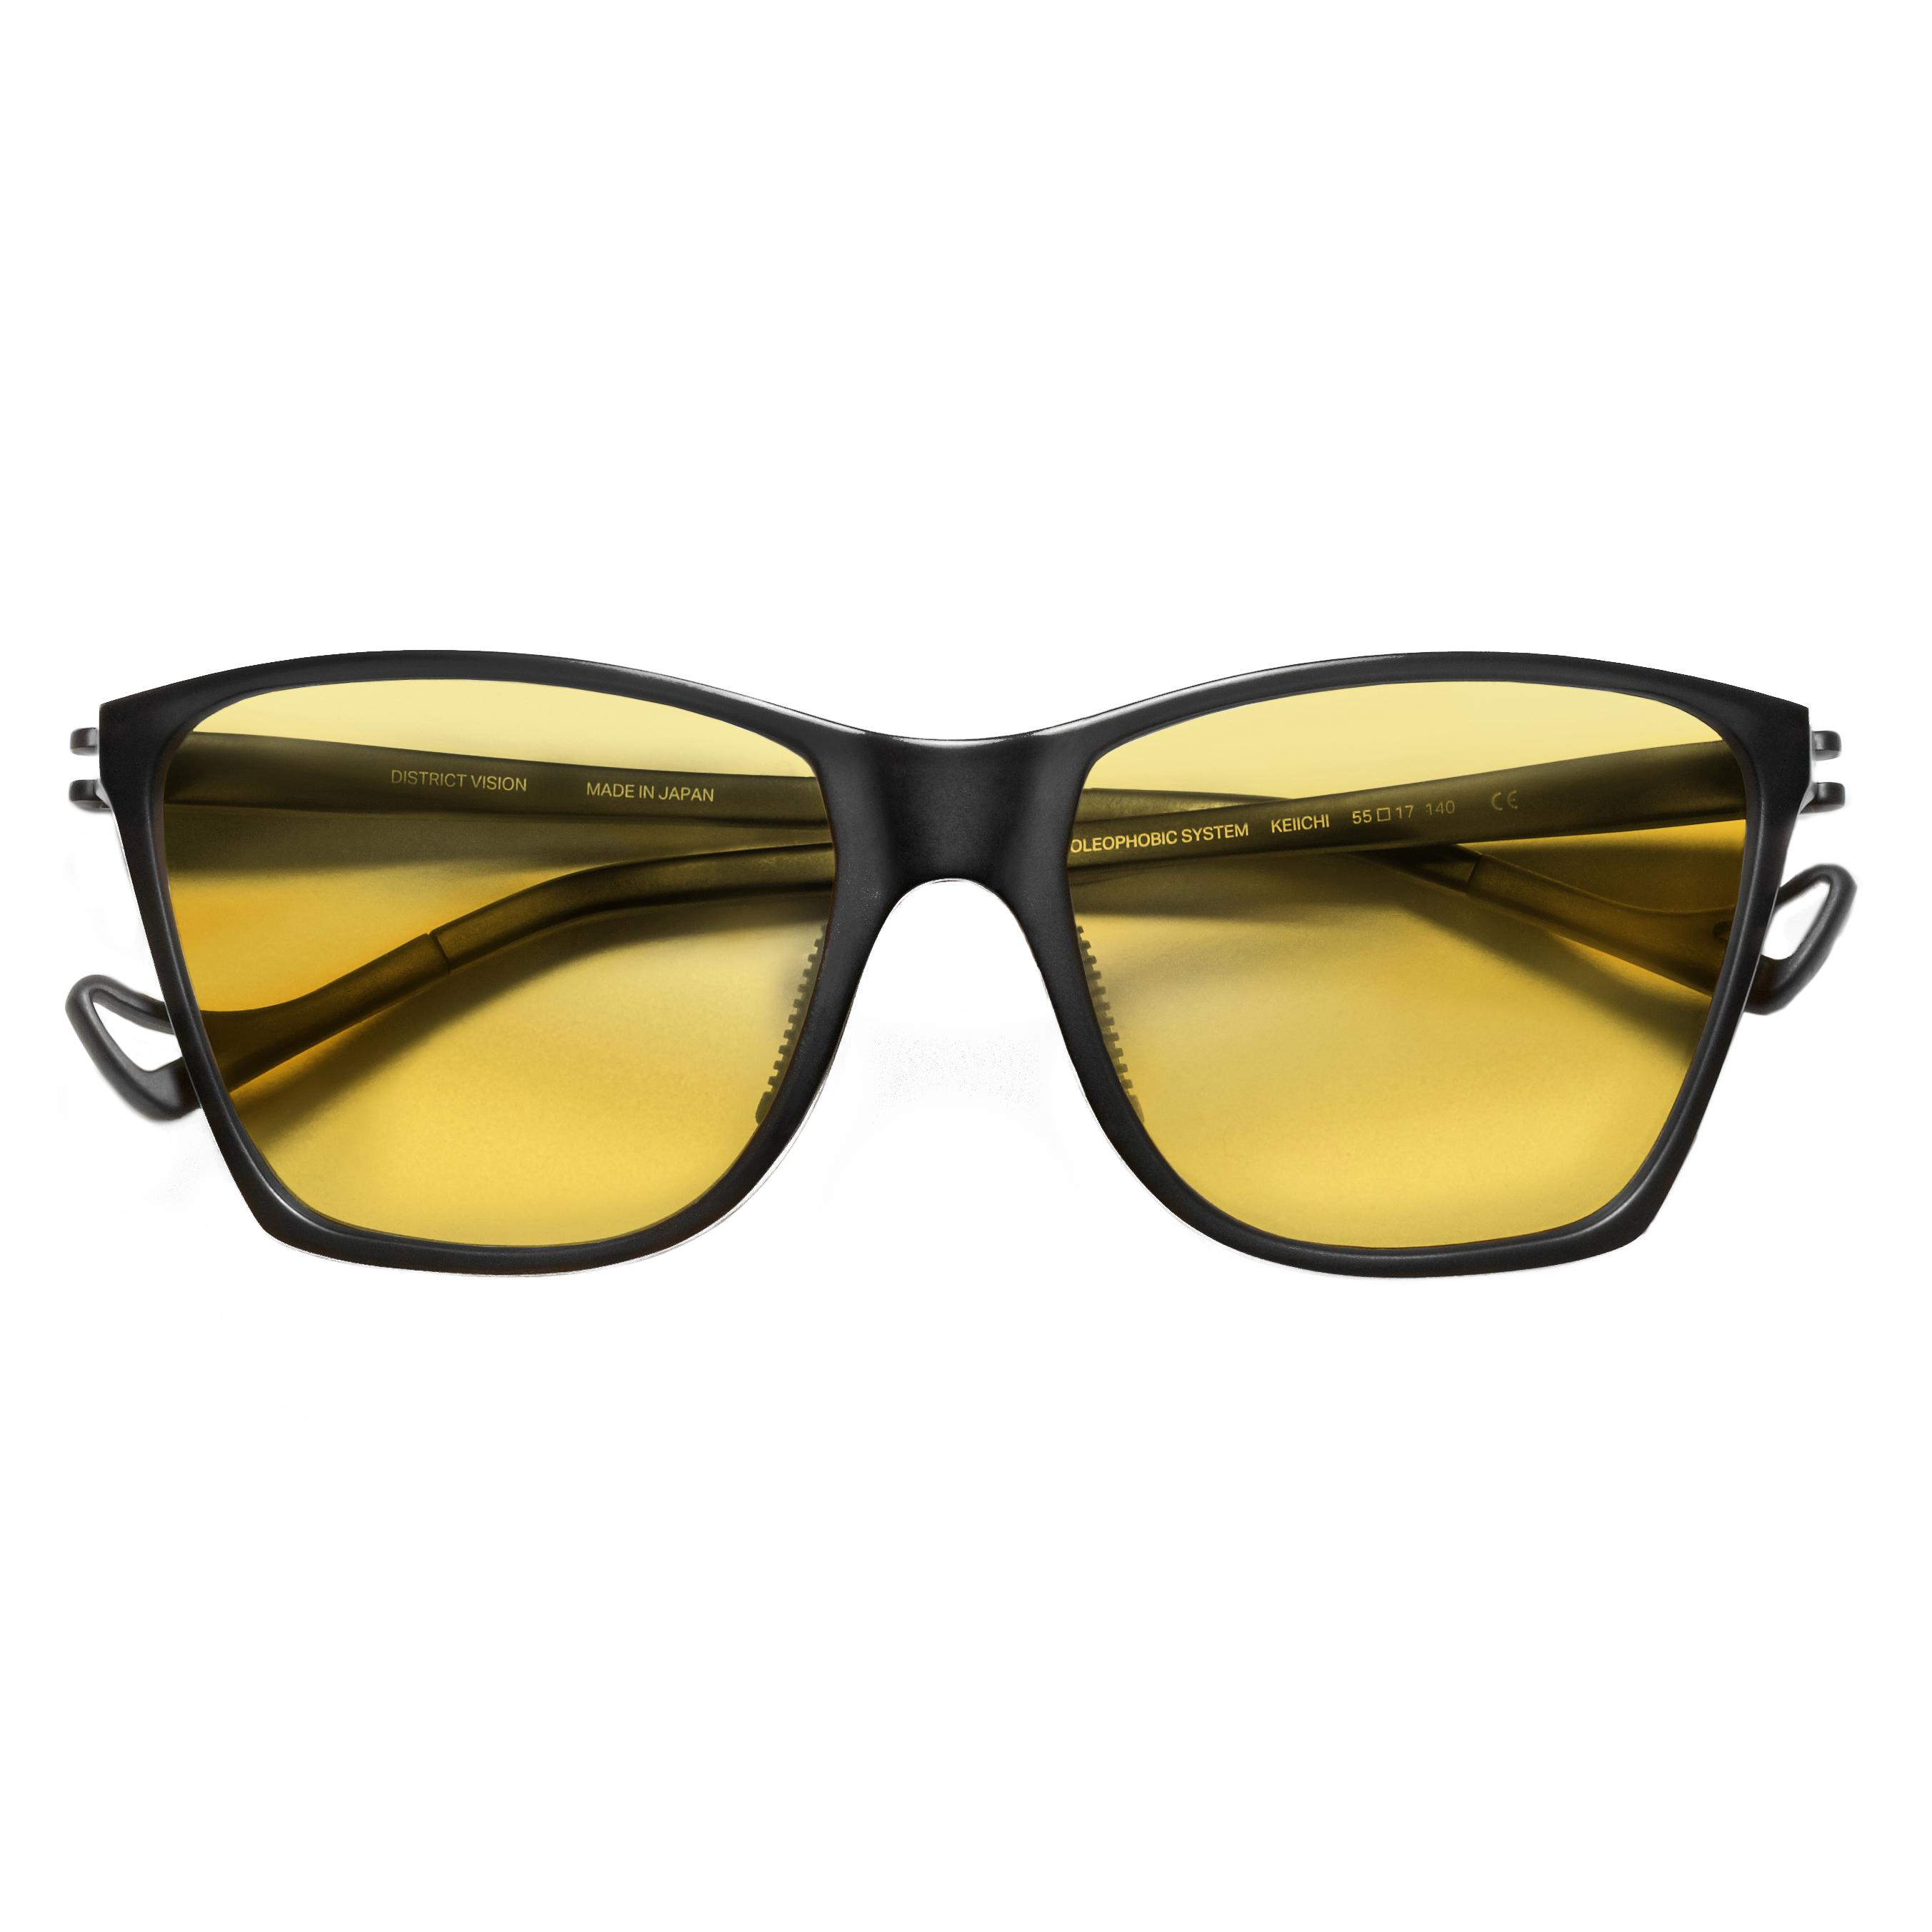 District Vision Keiichi Standard - Running Sunglasses